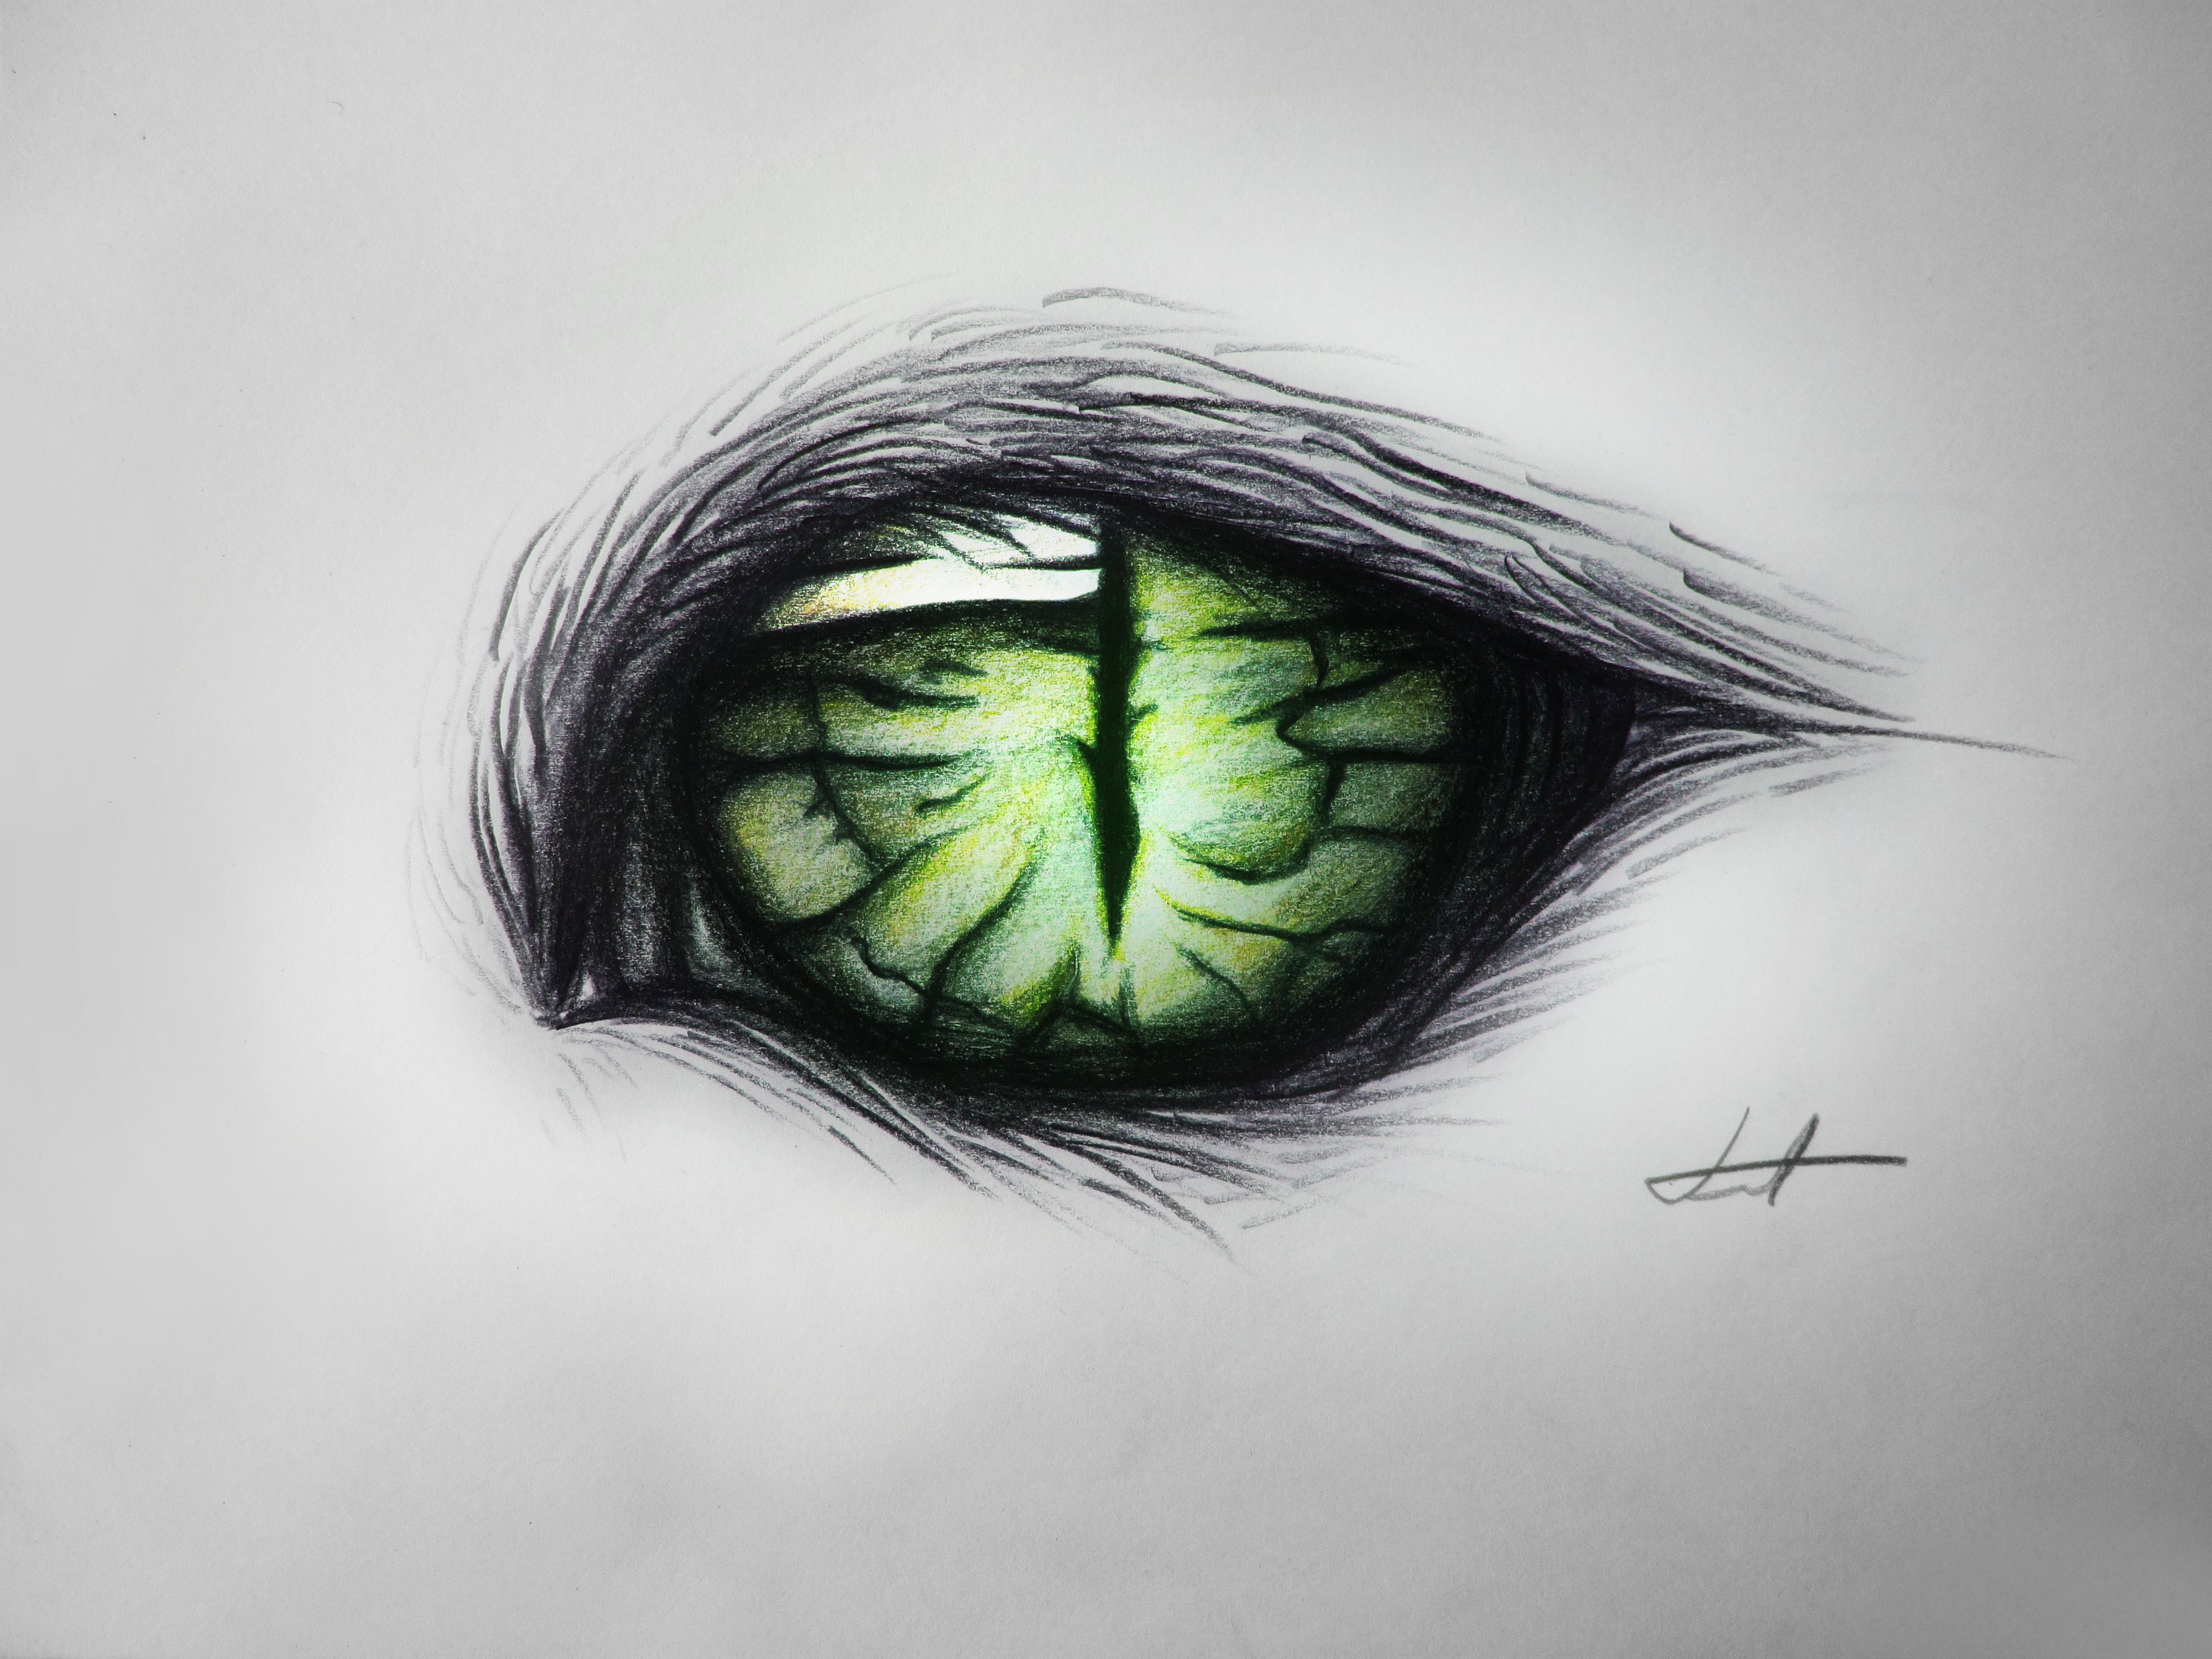 Cat eye - Dream by MuuseDesign on DeviantArt